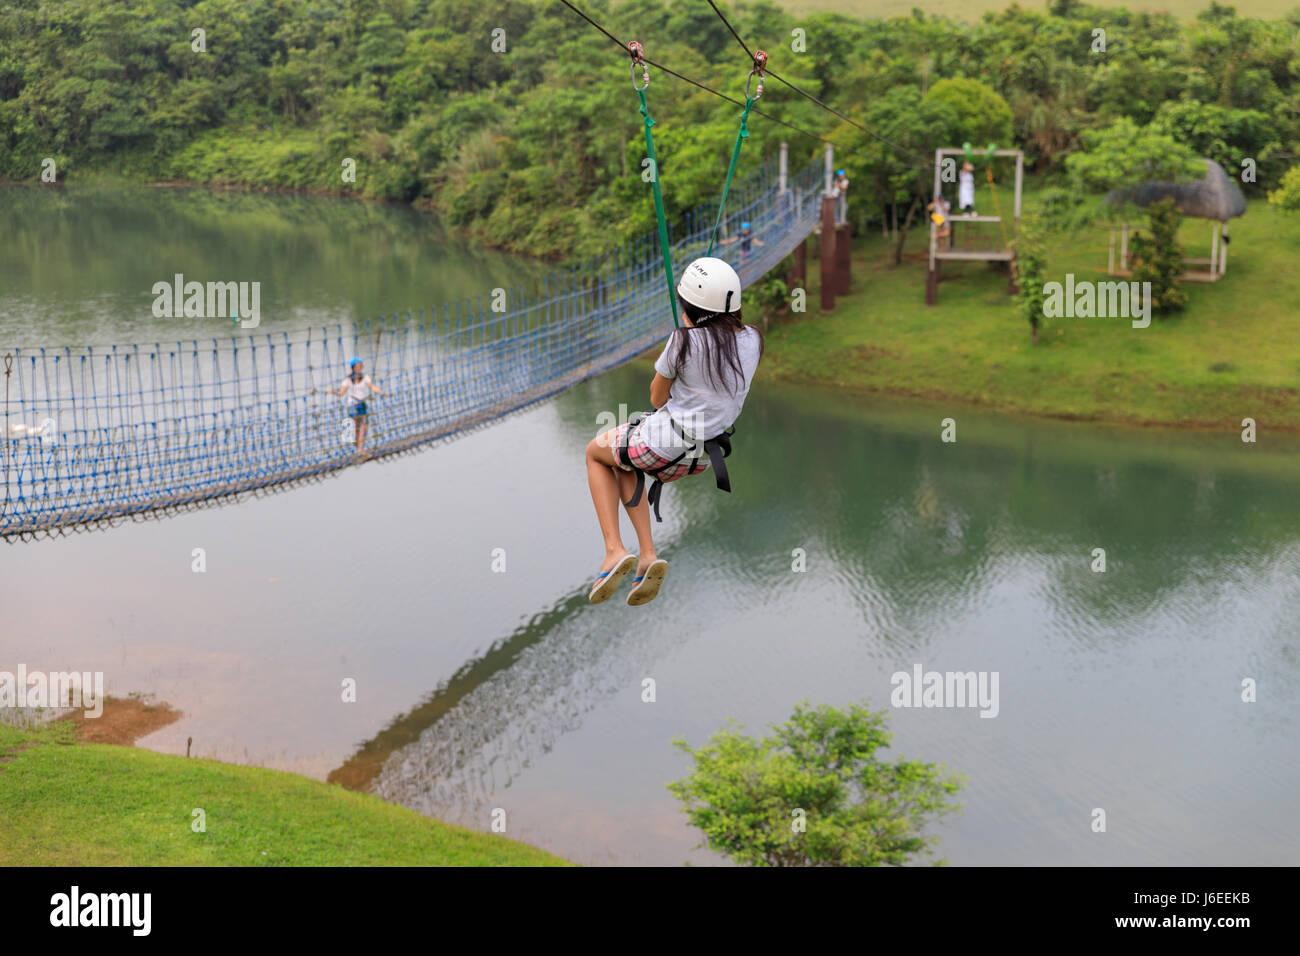 Sliding Zip Stockfotos & Sliding Zip Bilder - Alamy